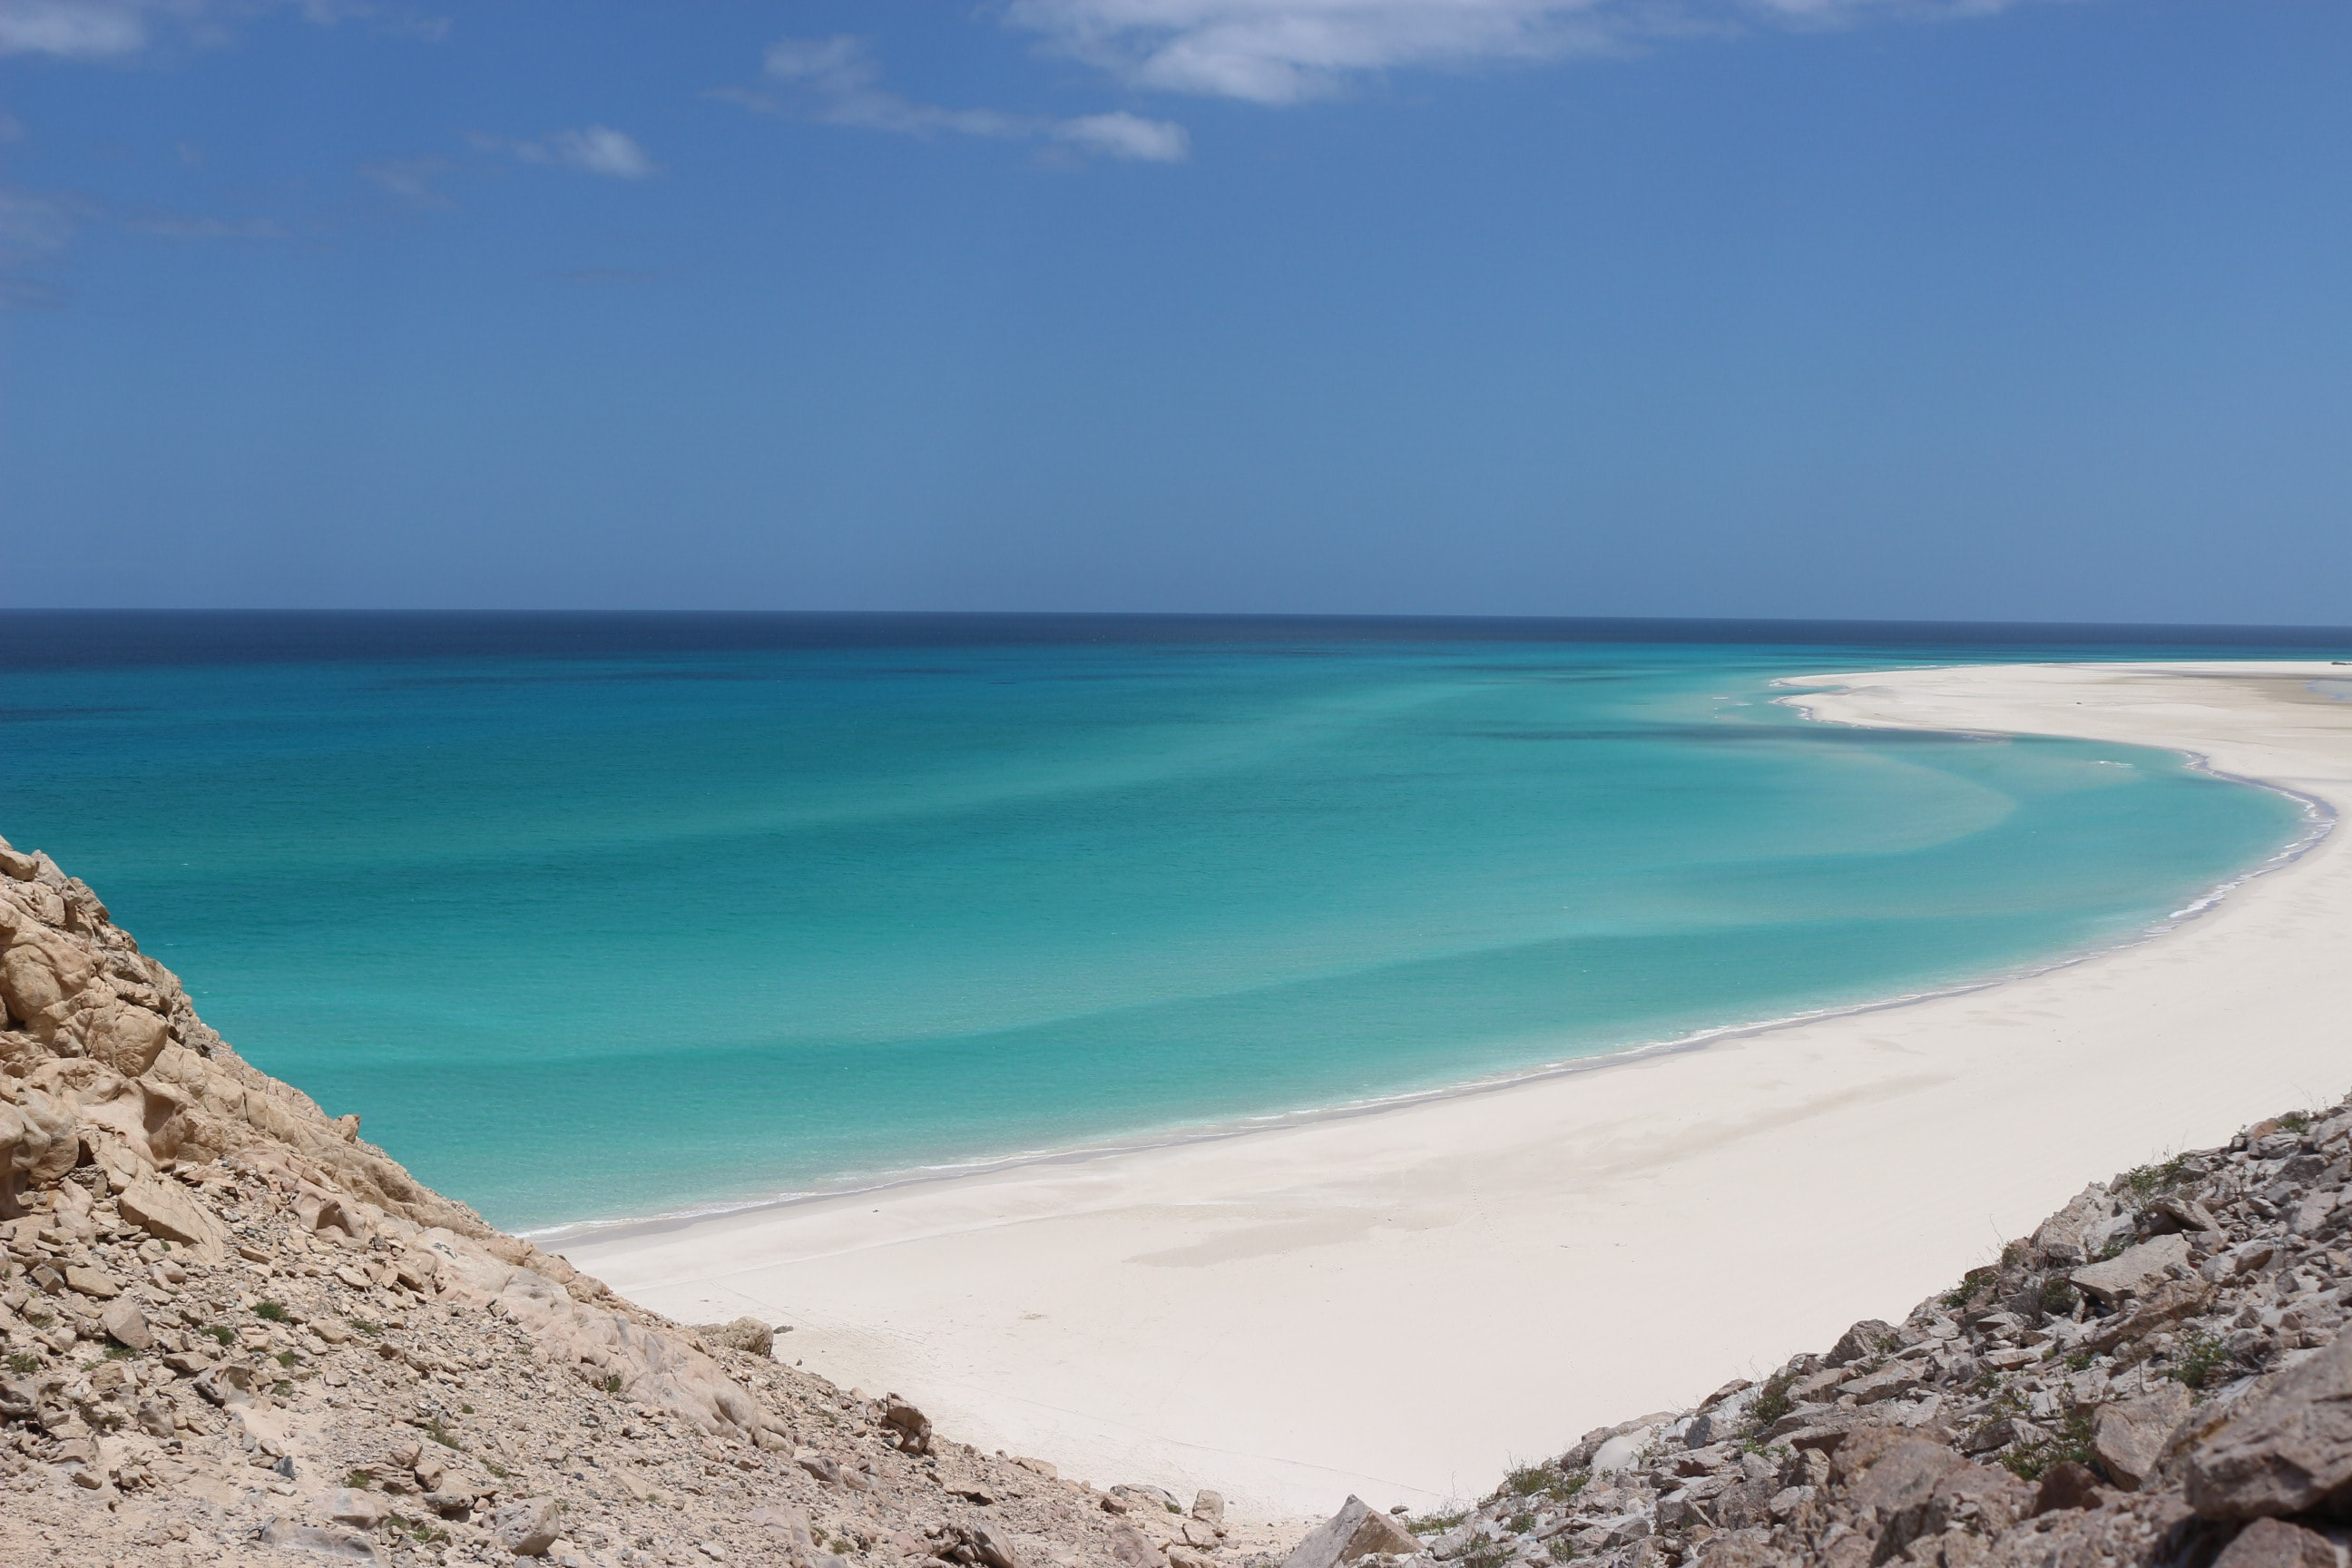 landscape photo of seashore under blue sky